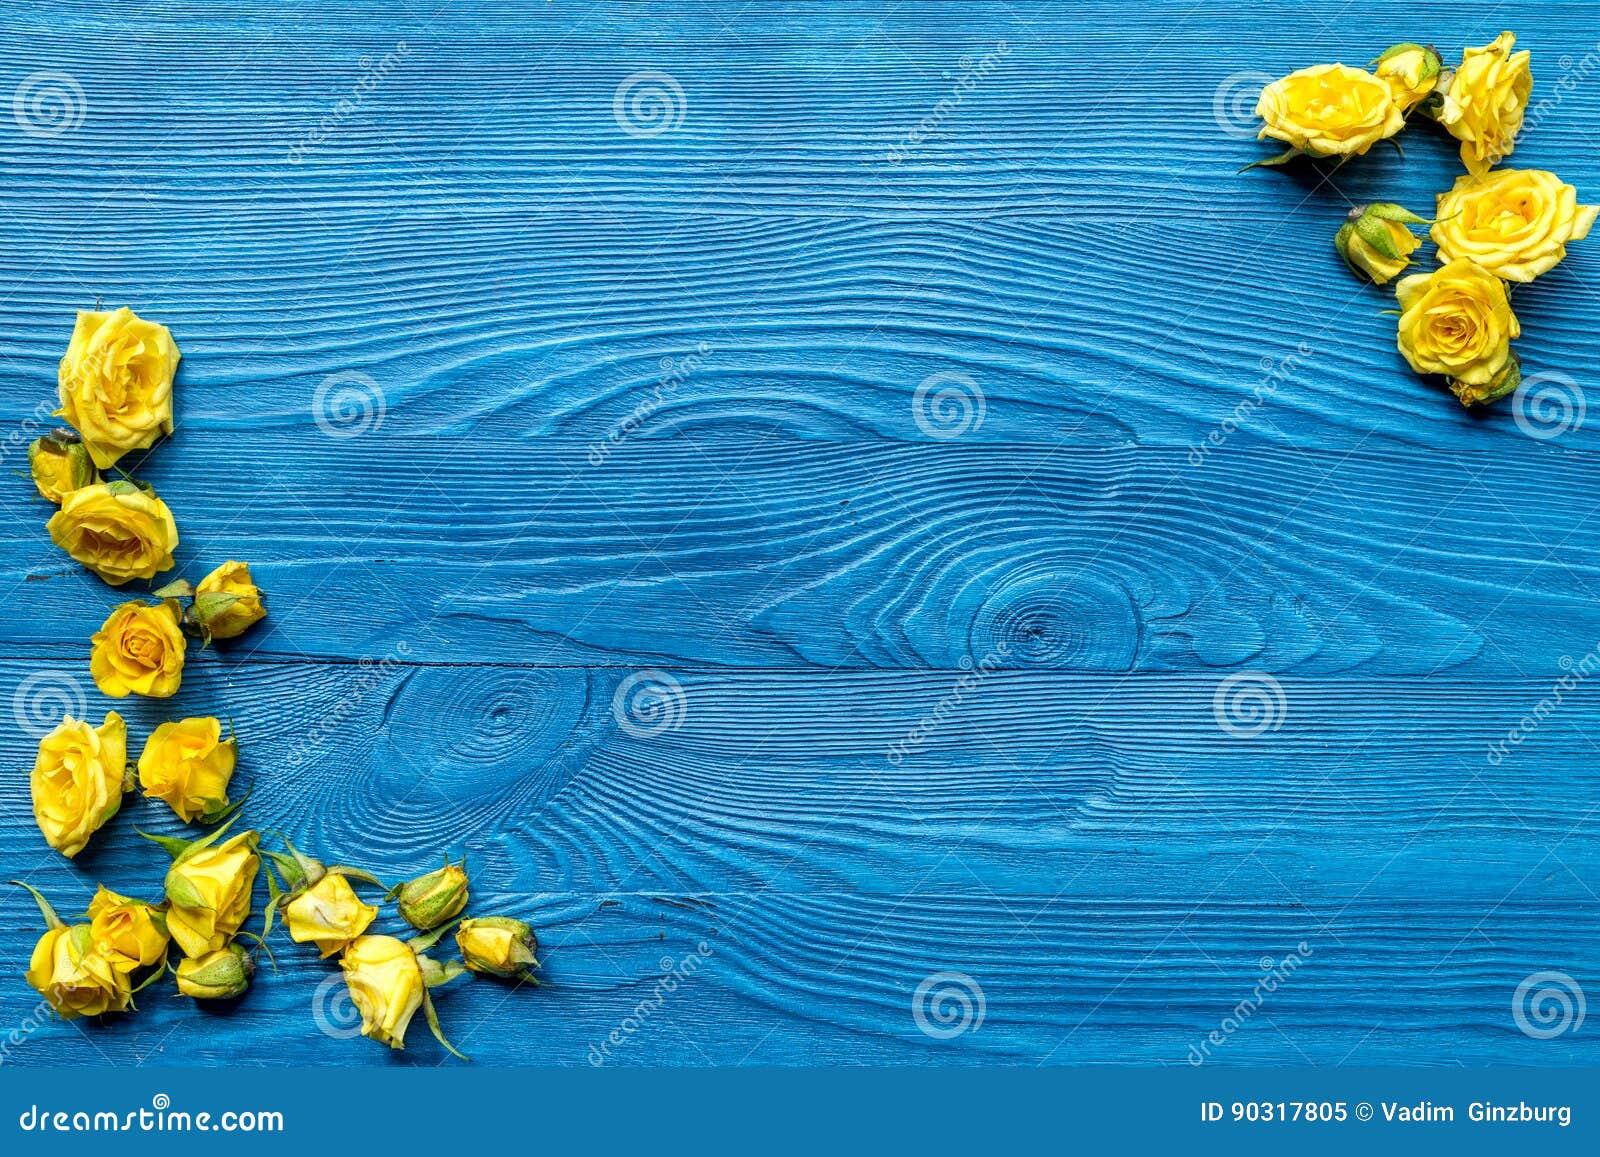 Spring design with roses on wooden desk background top